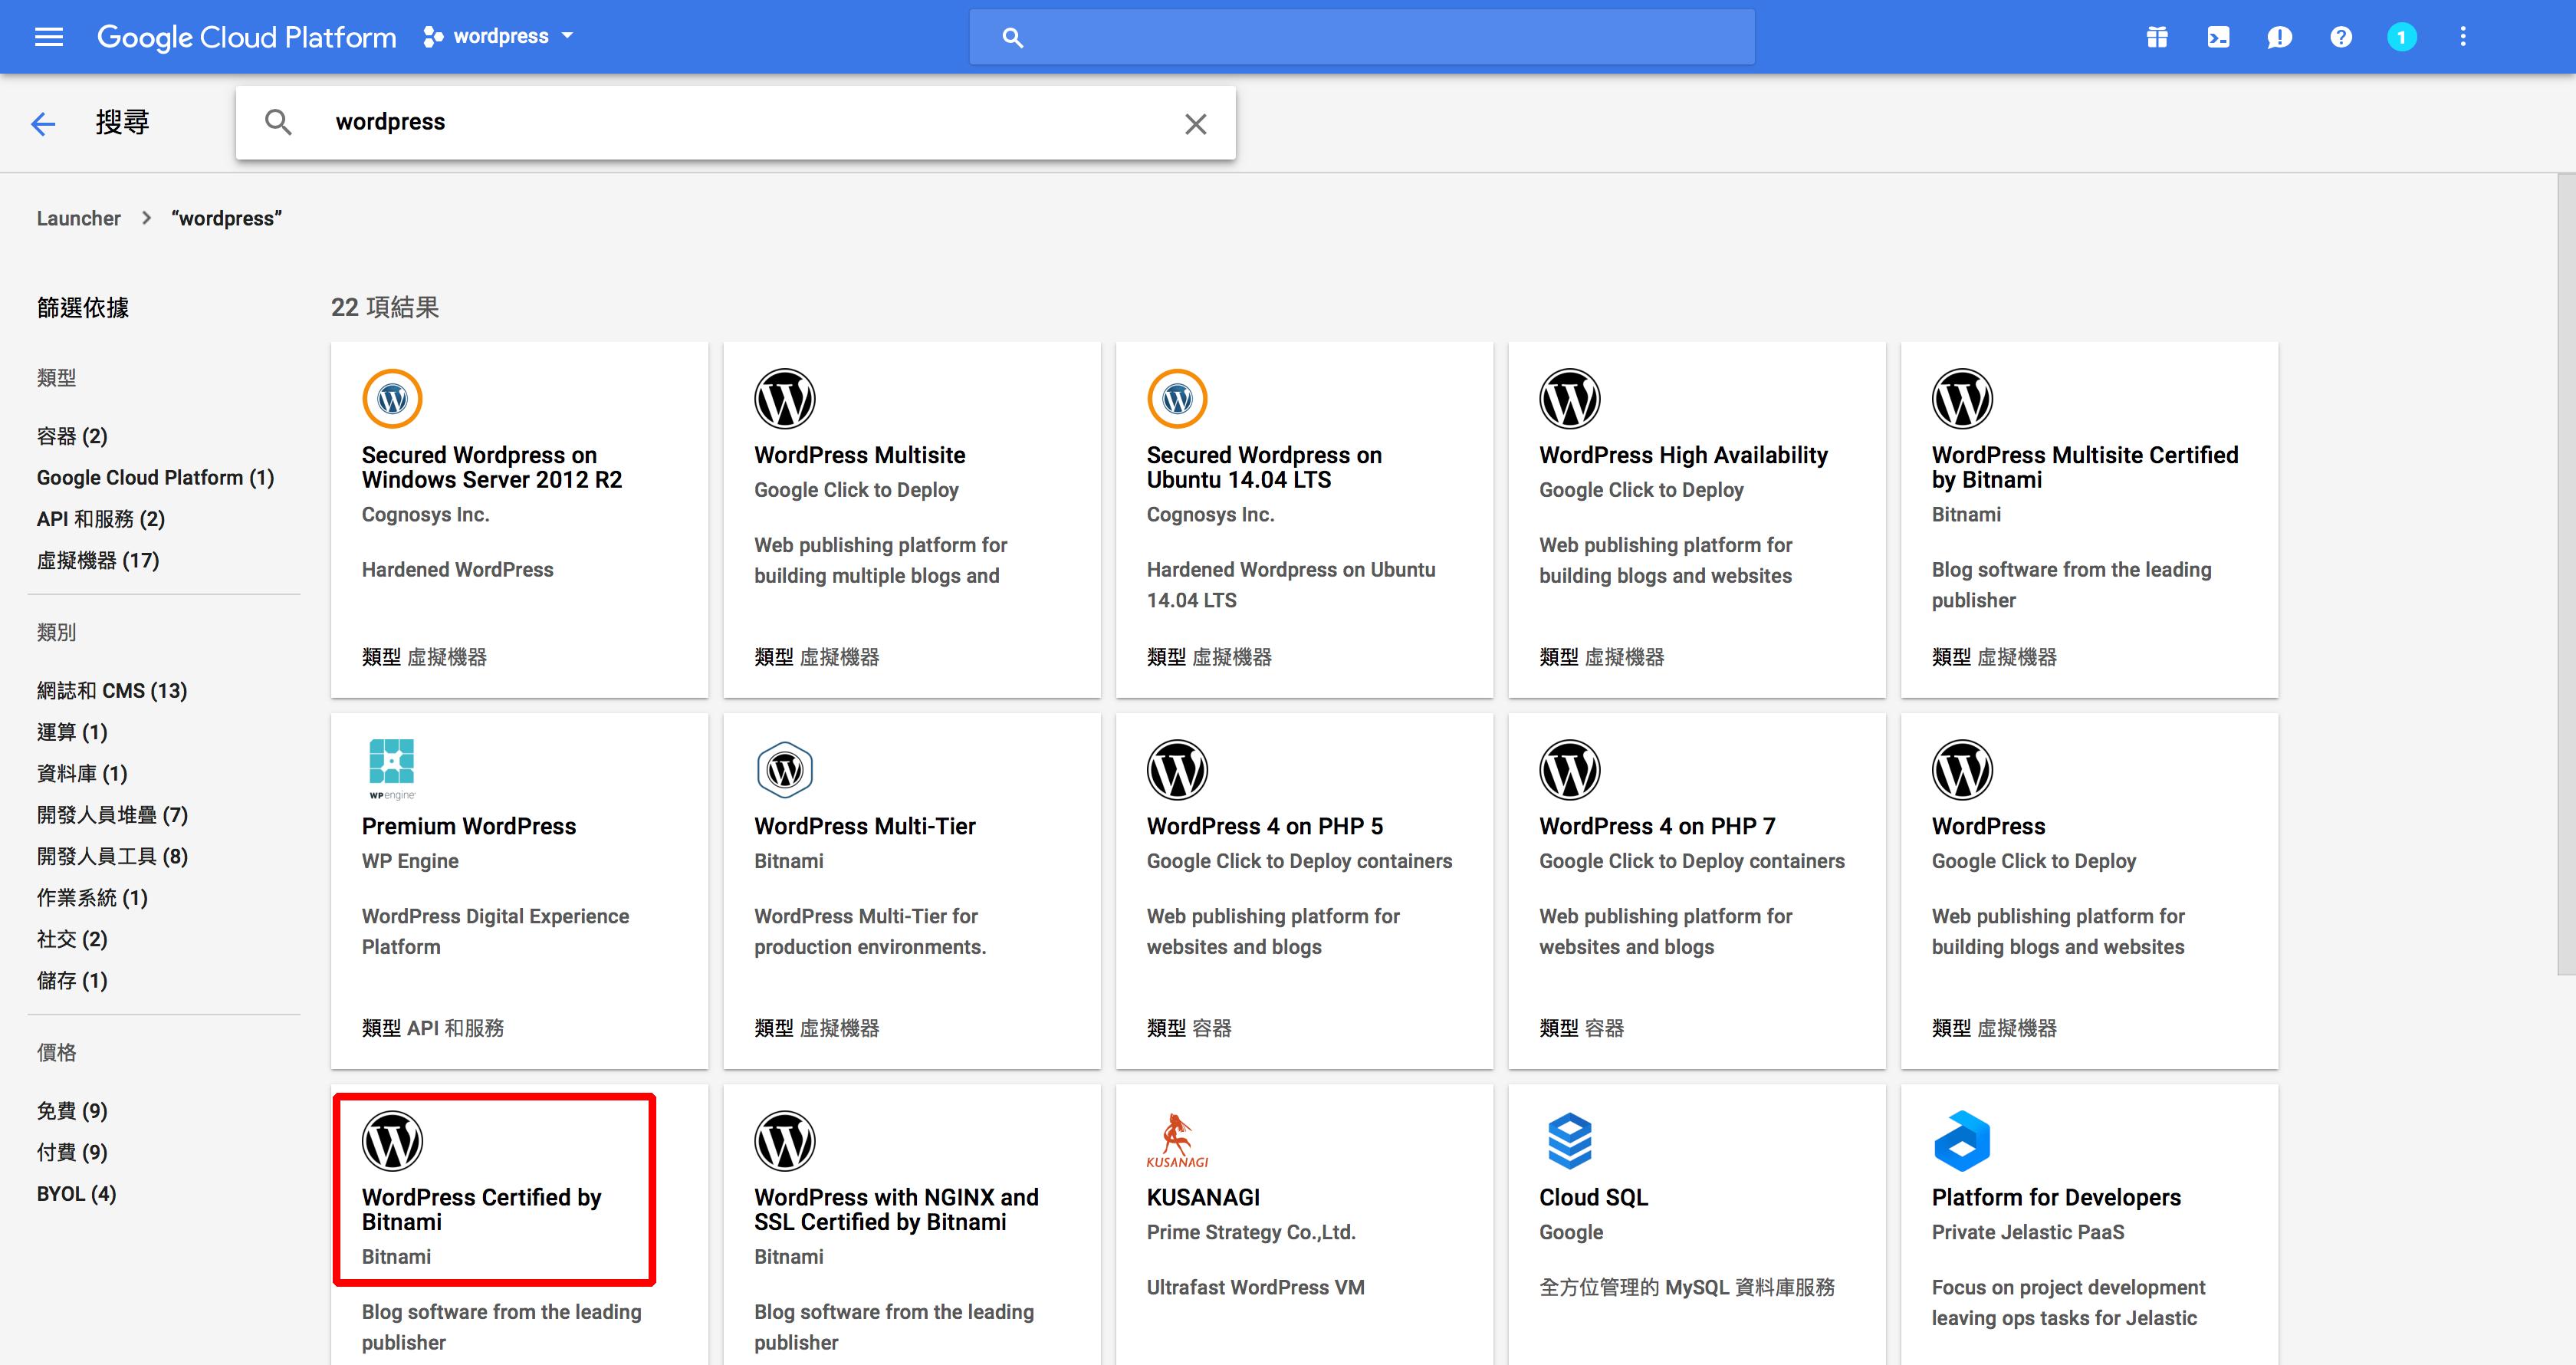 Google Cloud Console - Cloud Launcher 搜尋 wordpress